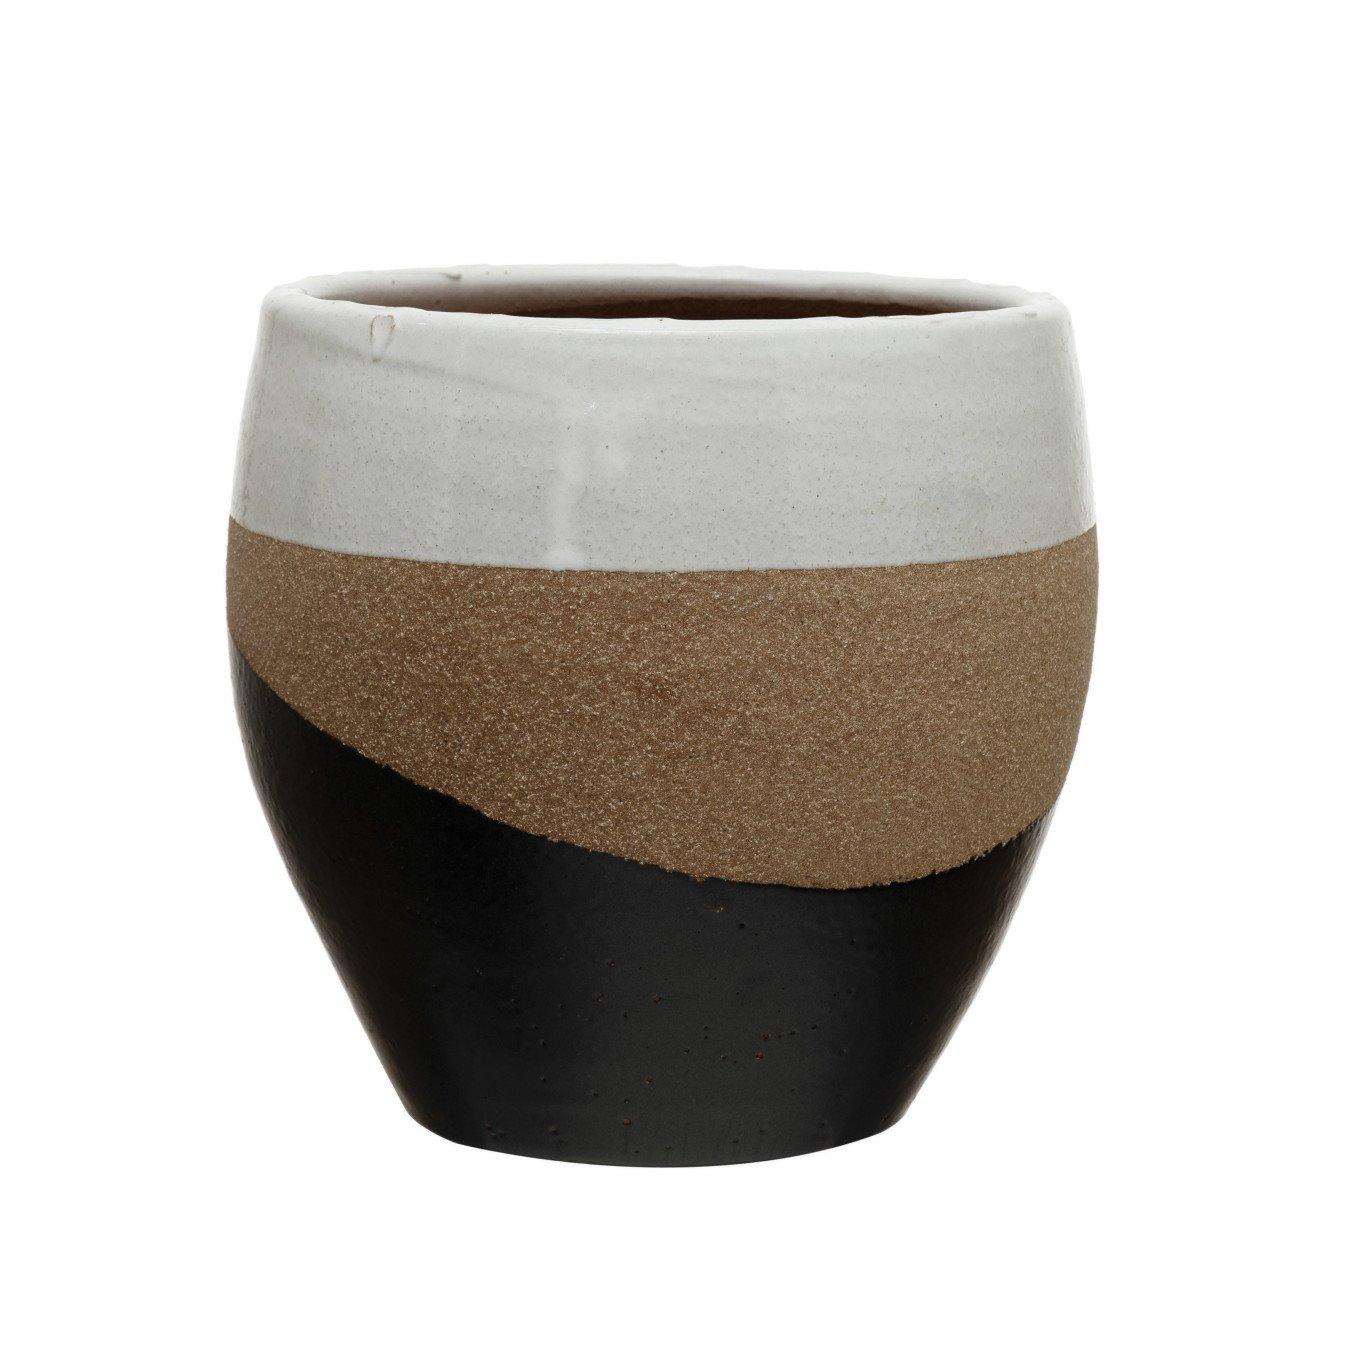 "Terra-cotta Planter, Multi Color (Holds 7"" Pot)"